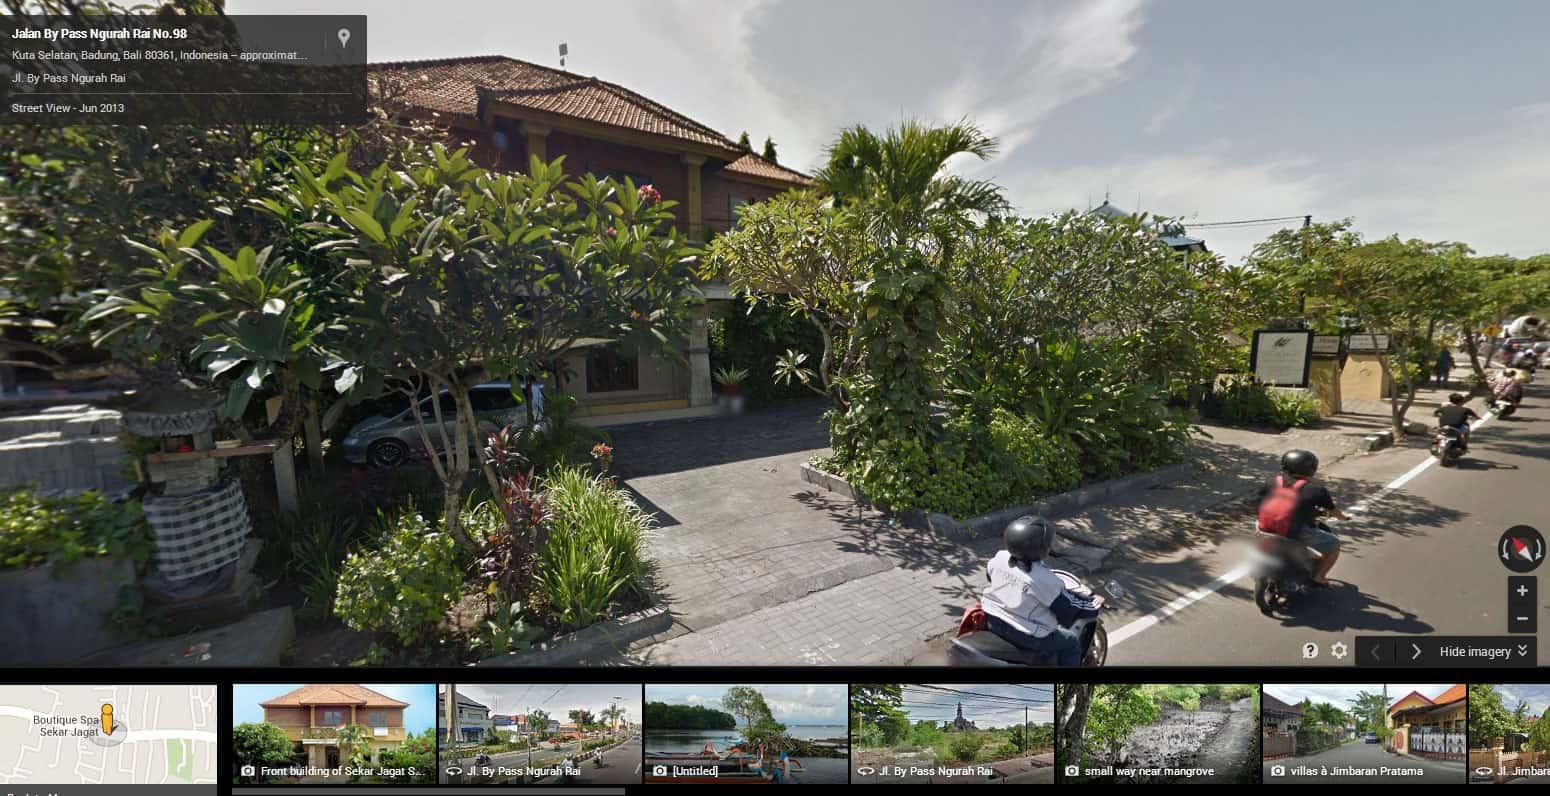 Nusa Dua Street View